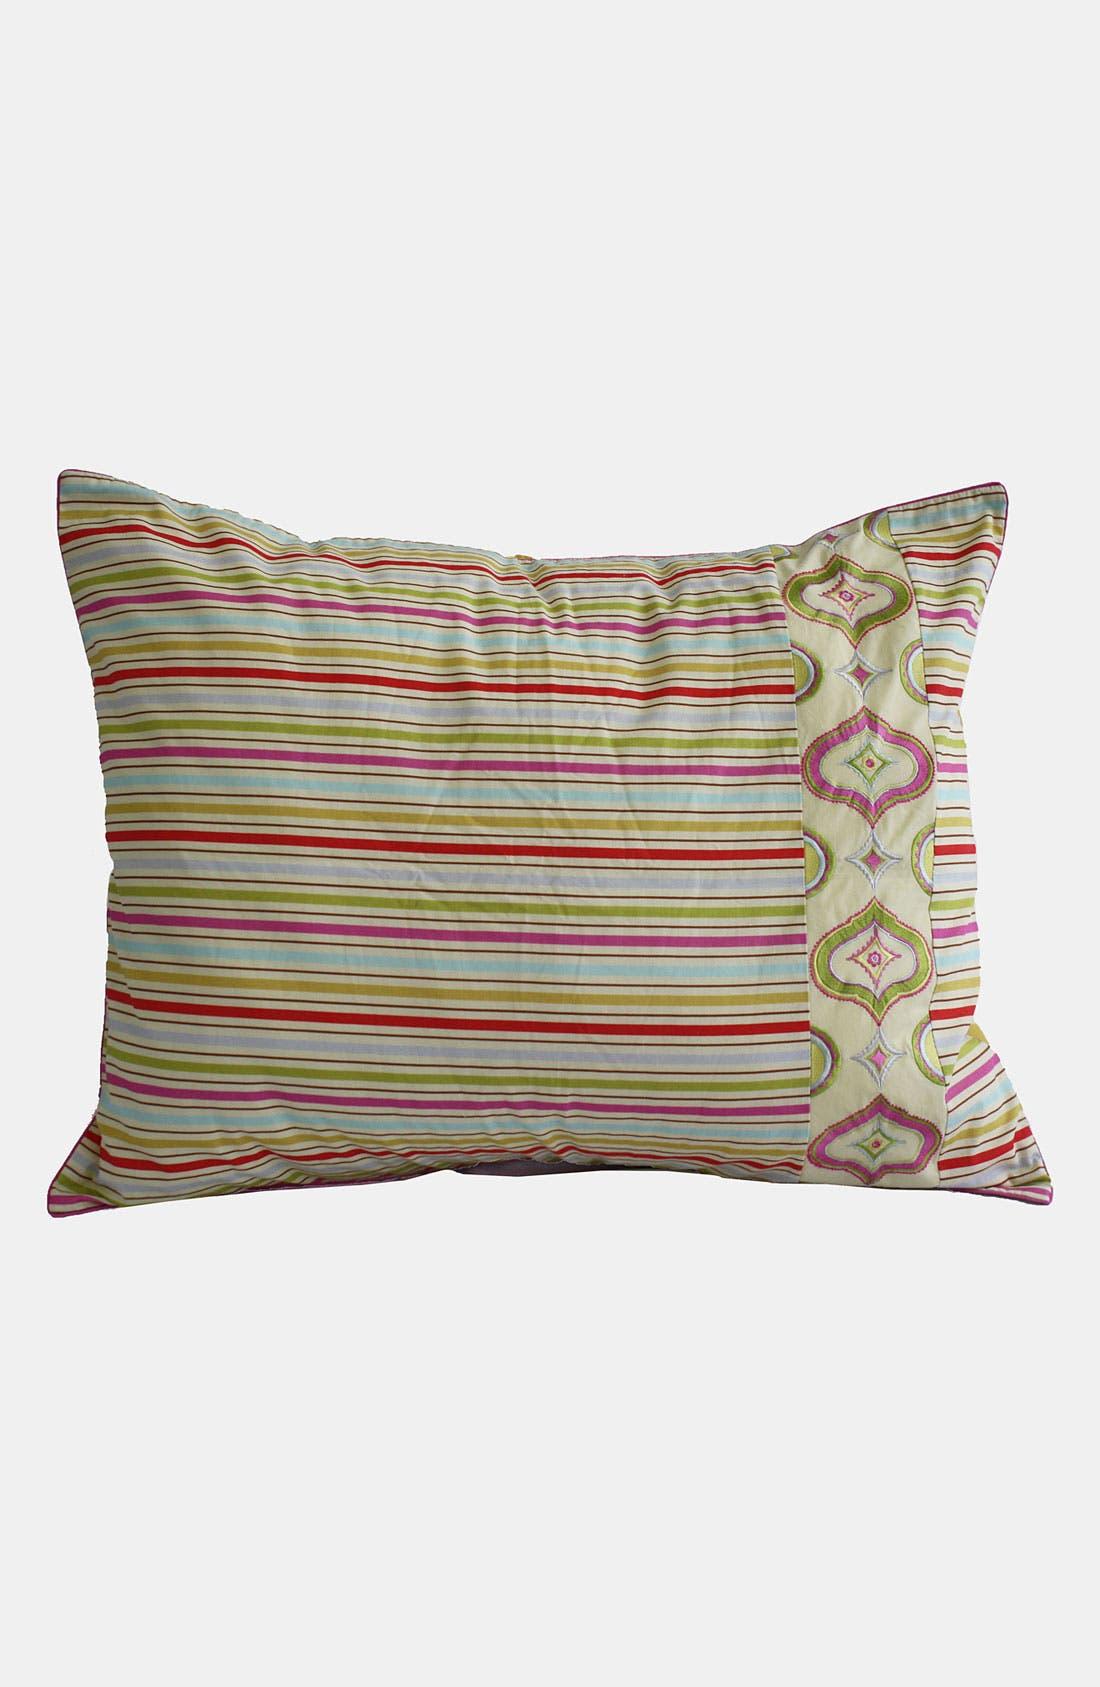 Alternate Image 1 Selected - Dena Home 'Zarina' Pillow Sham